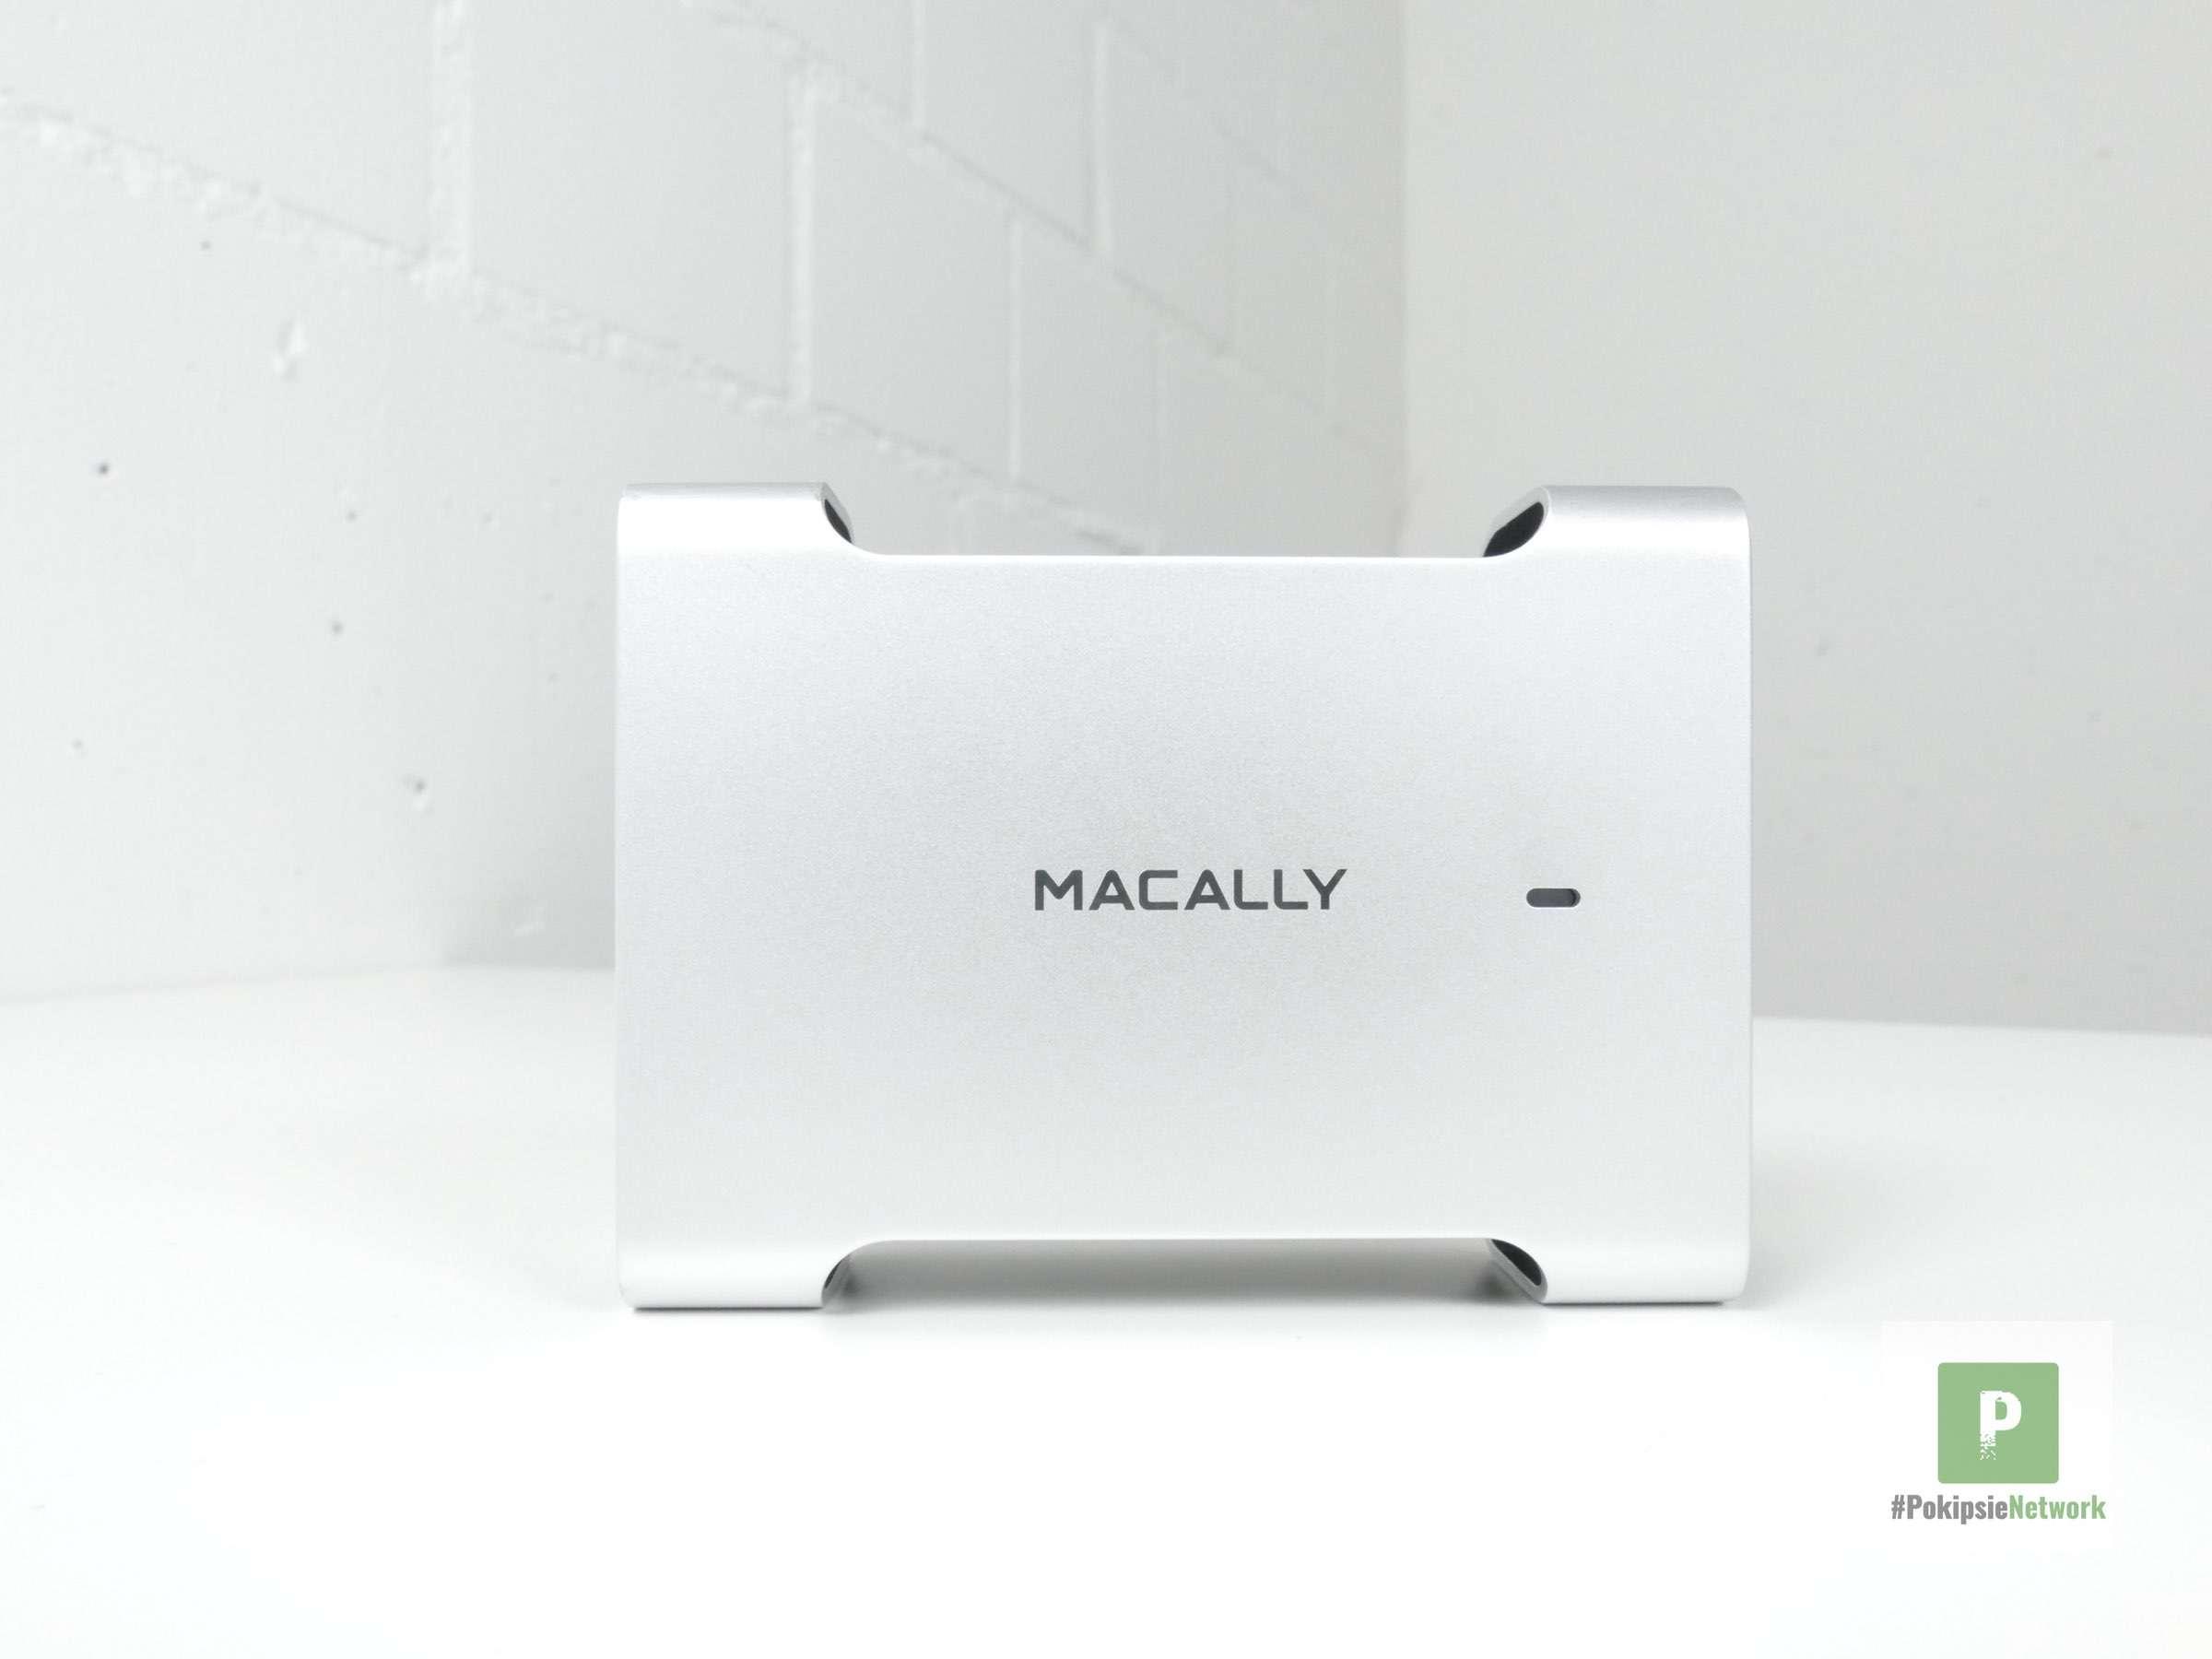 Macally MacBook Ladeadapter